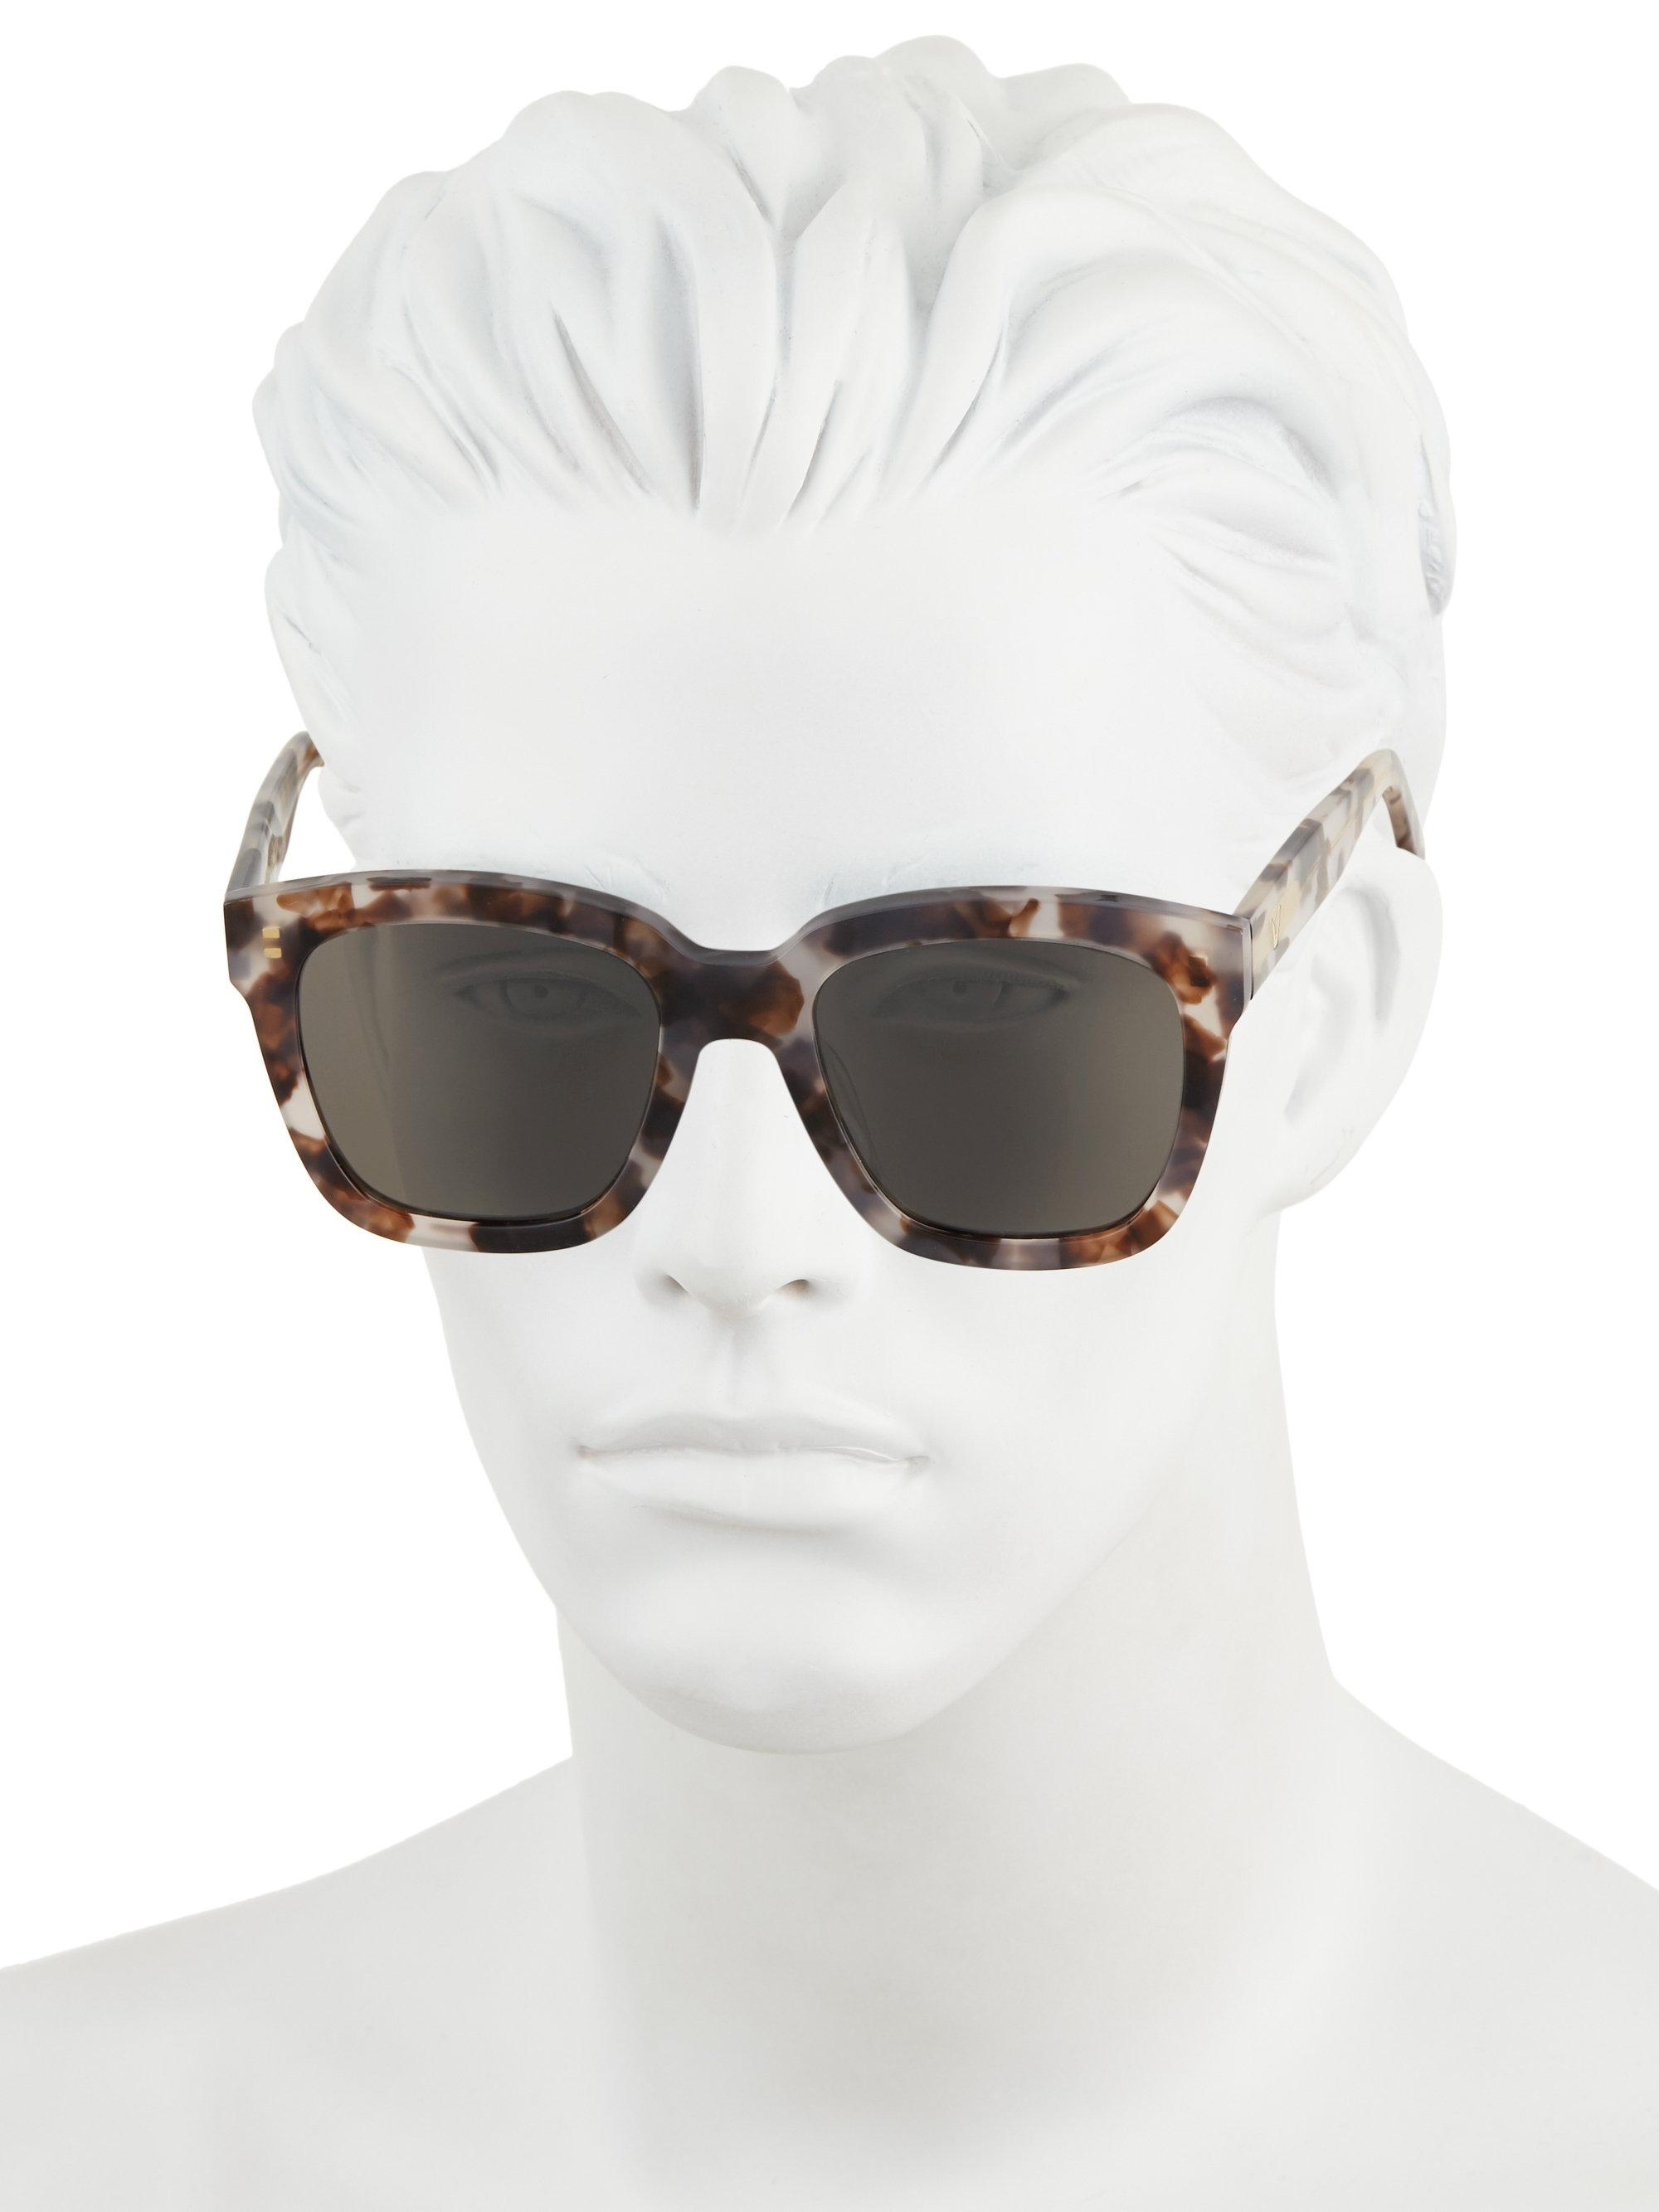 4b7d3ba4013c Lyst - Gentle Monster Dreamer Hoff Patterned Square Sunglasses in ...